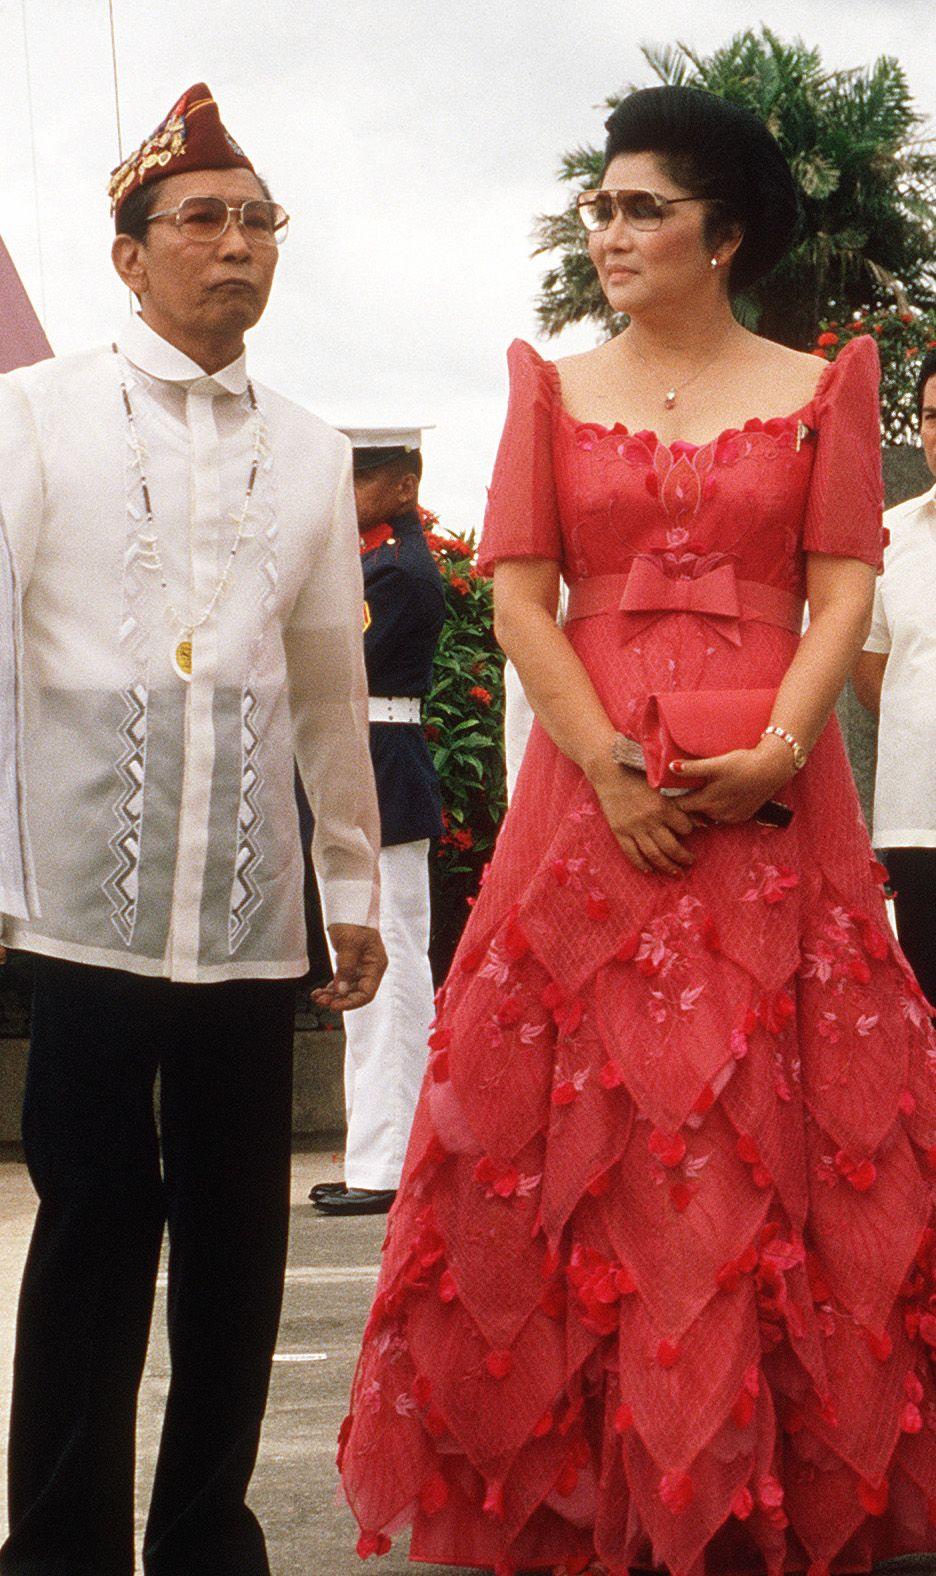 imelda marcos | My dream wedding in 2019 | Philippines dress